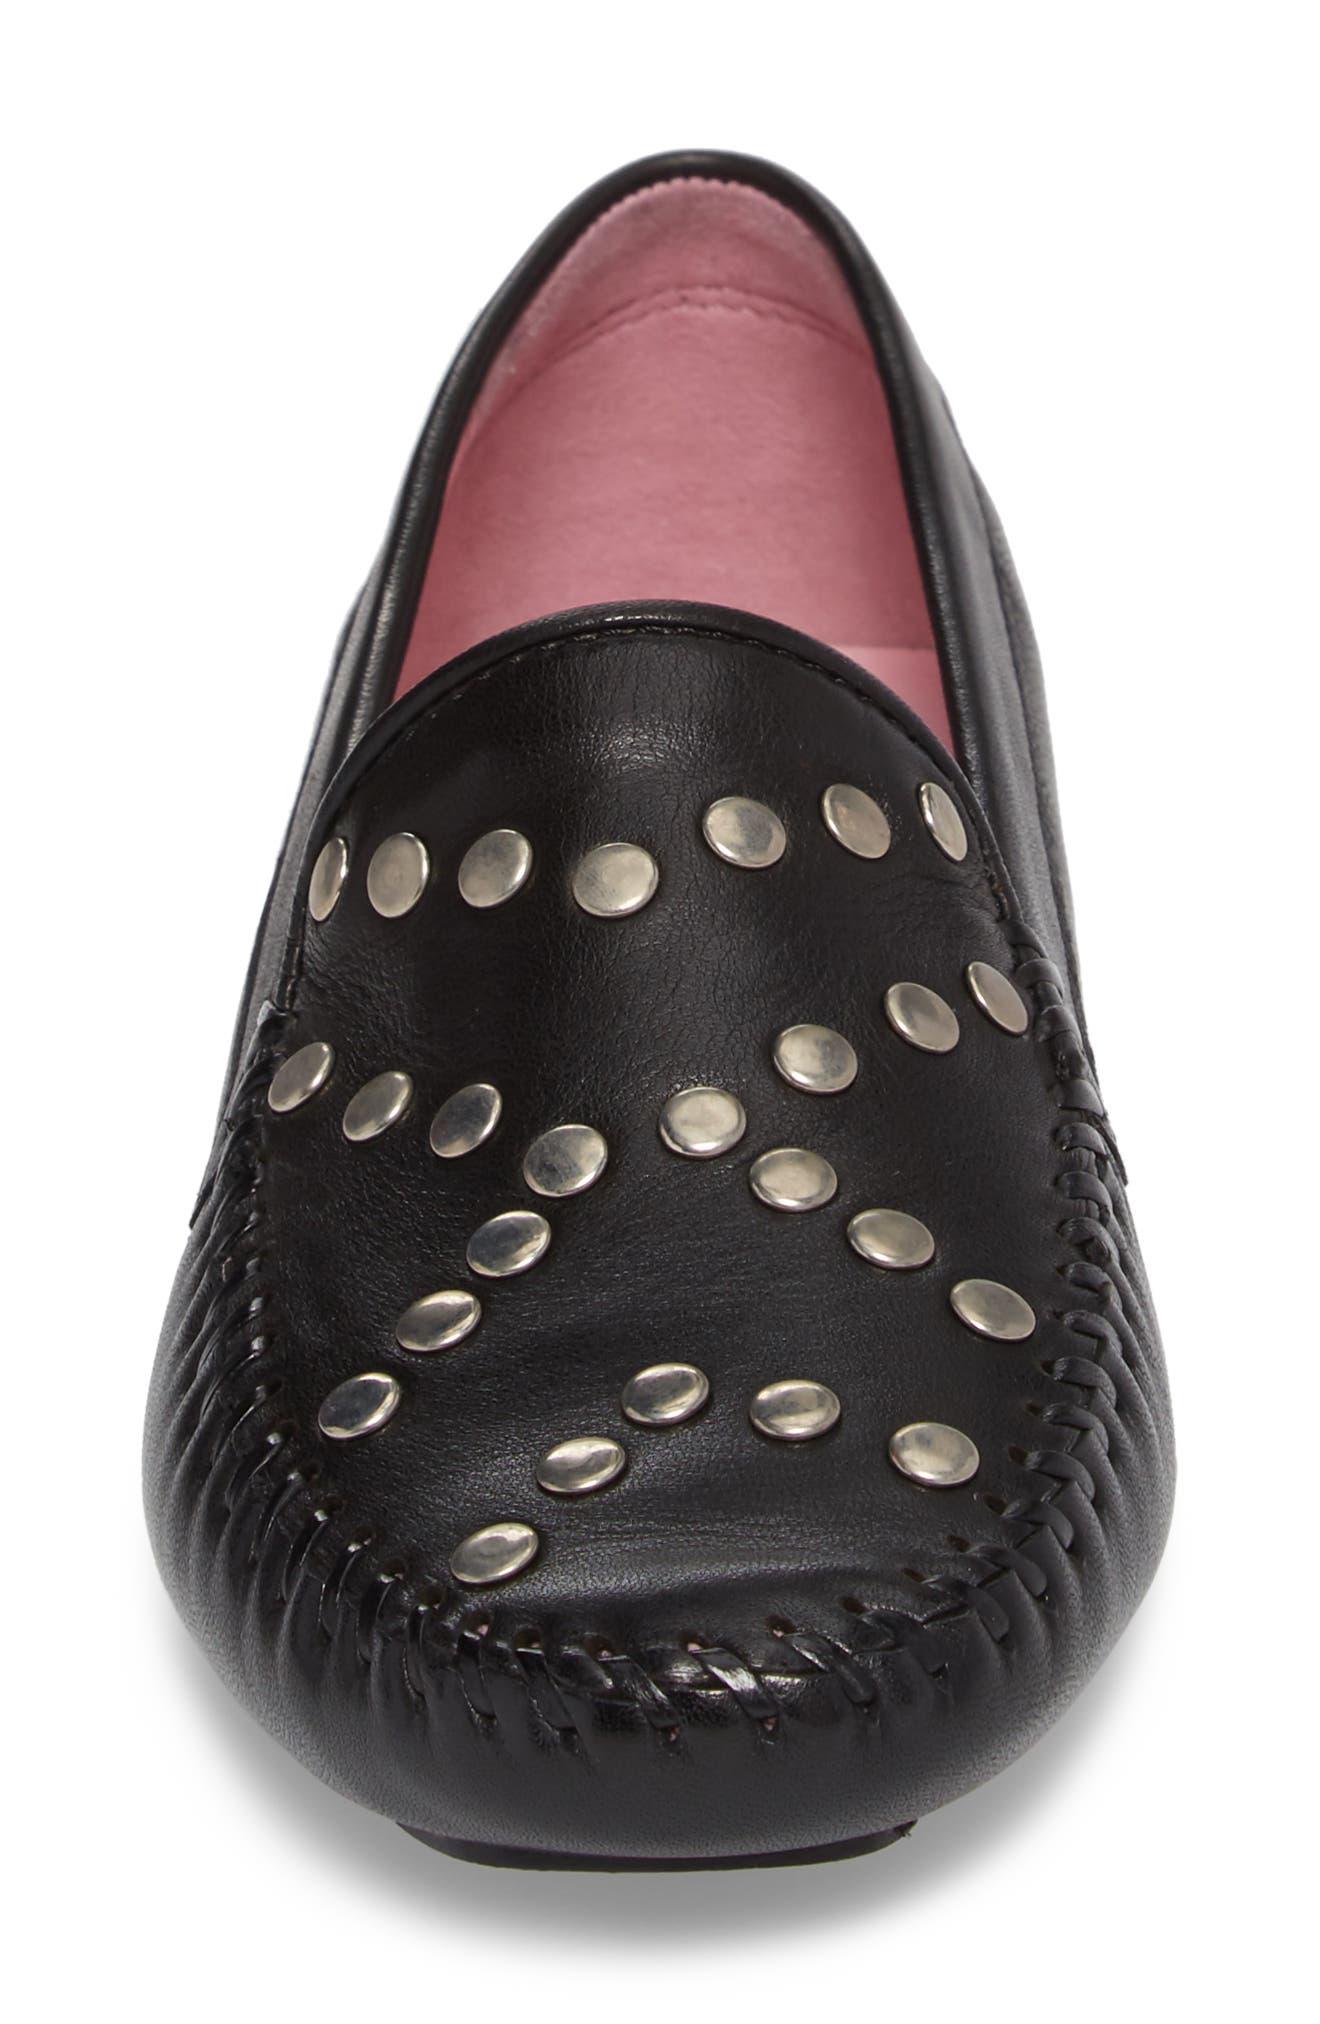 Tinae Studded Loafer,                             Alternate thumbnail 4, color,                             Black Leather